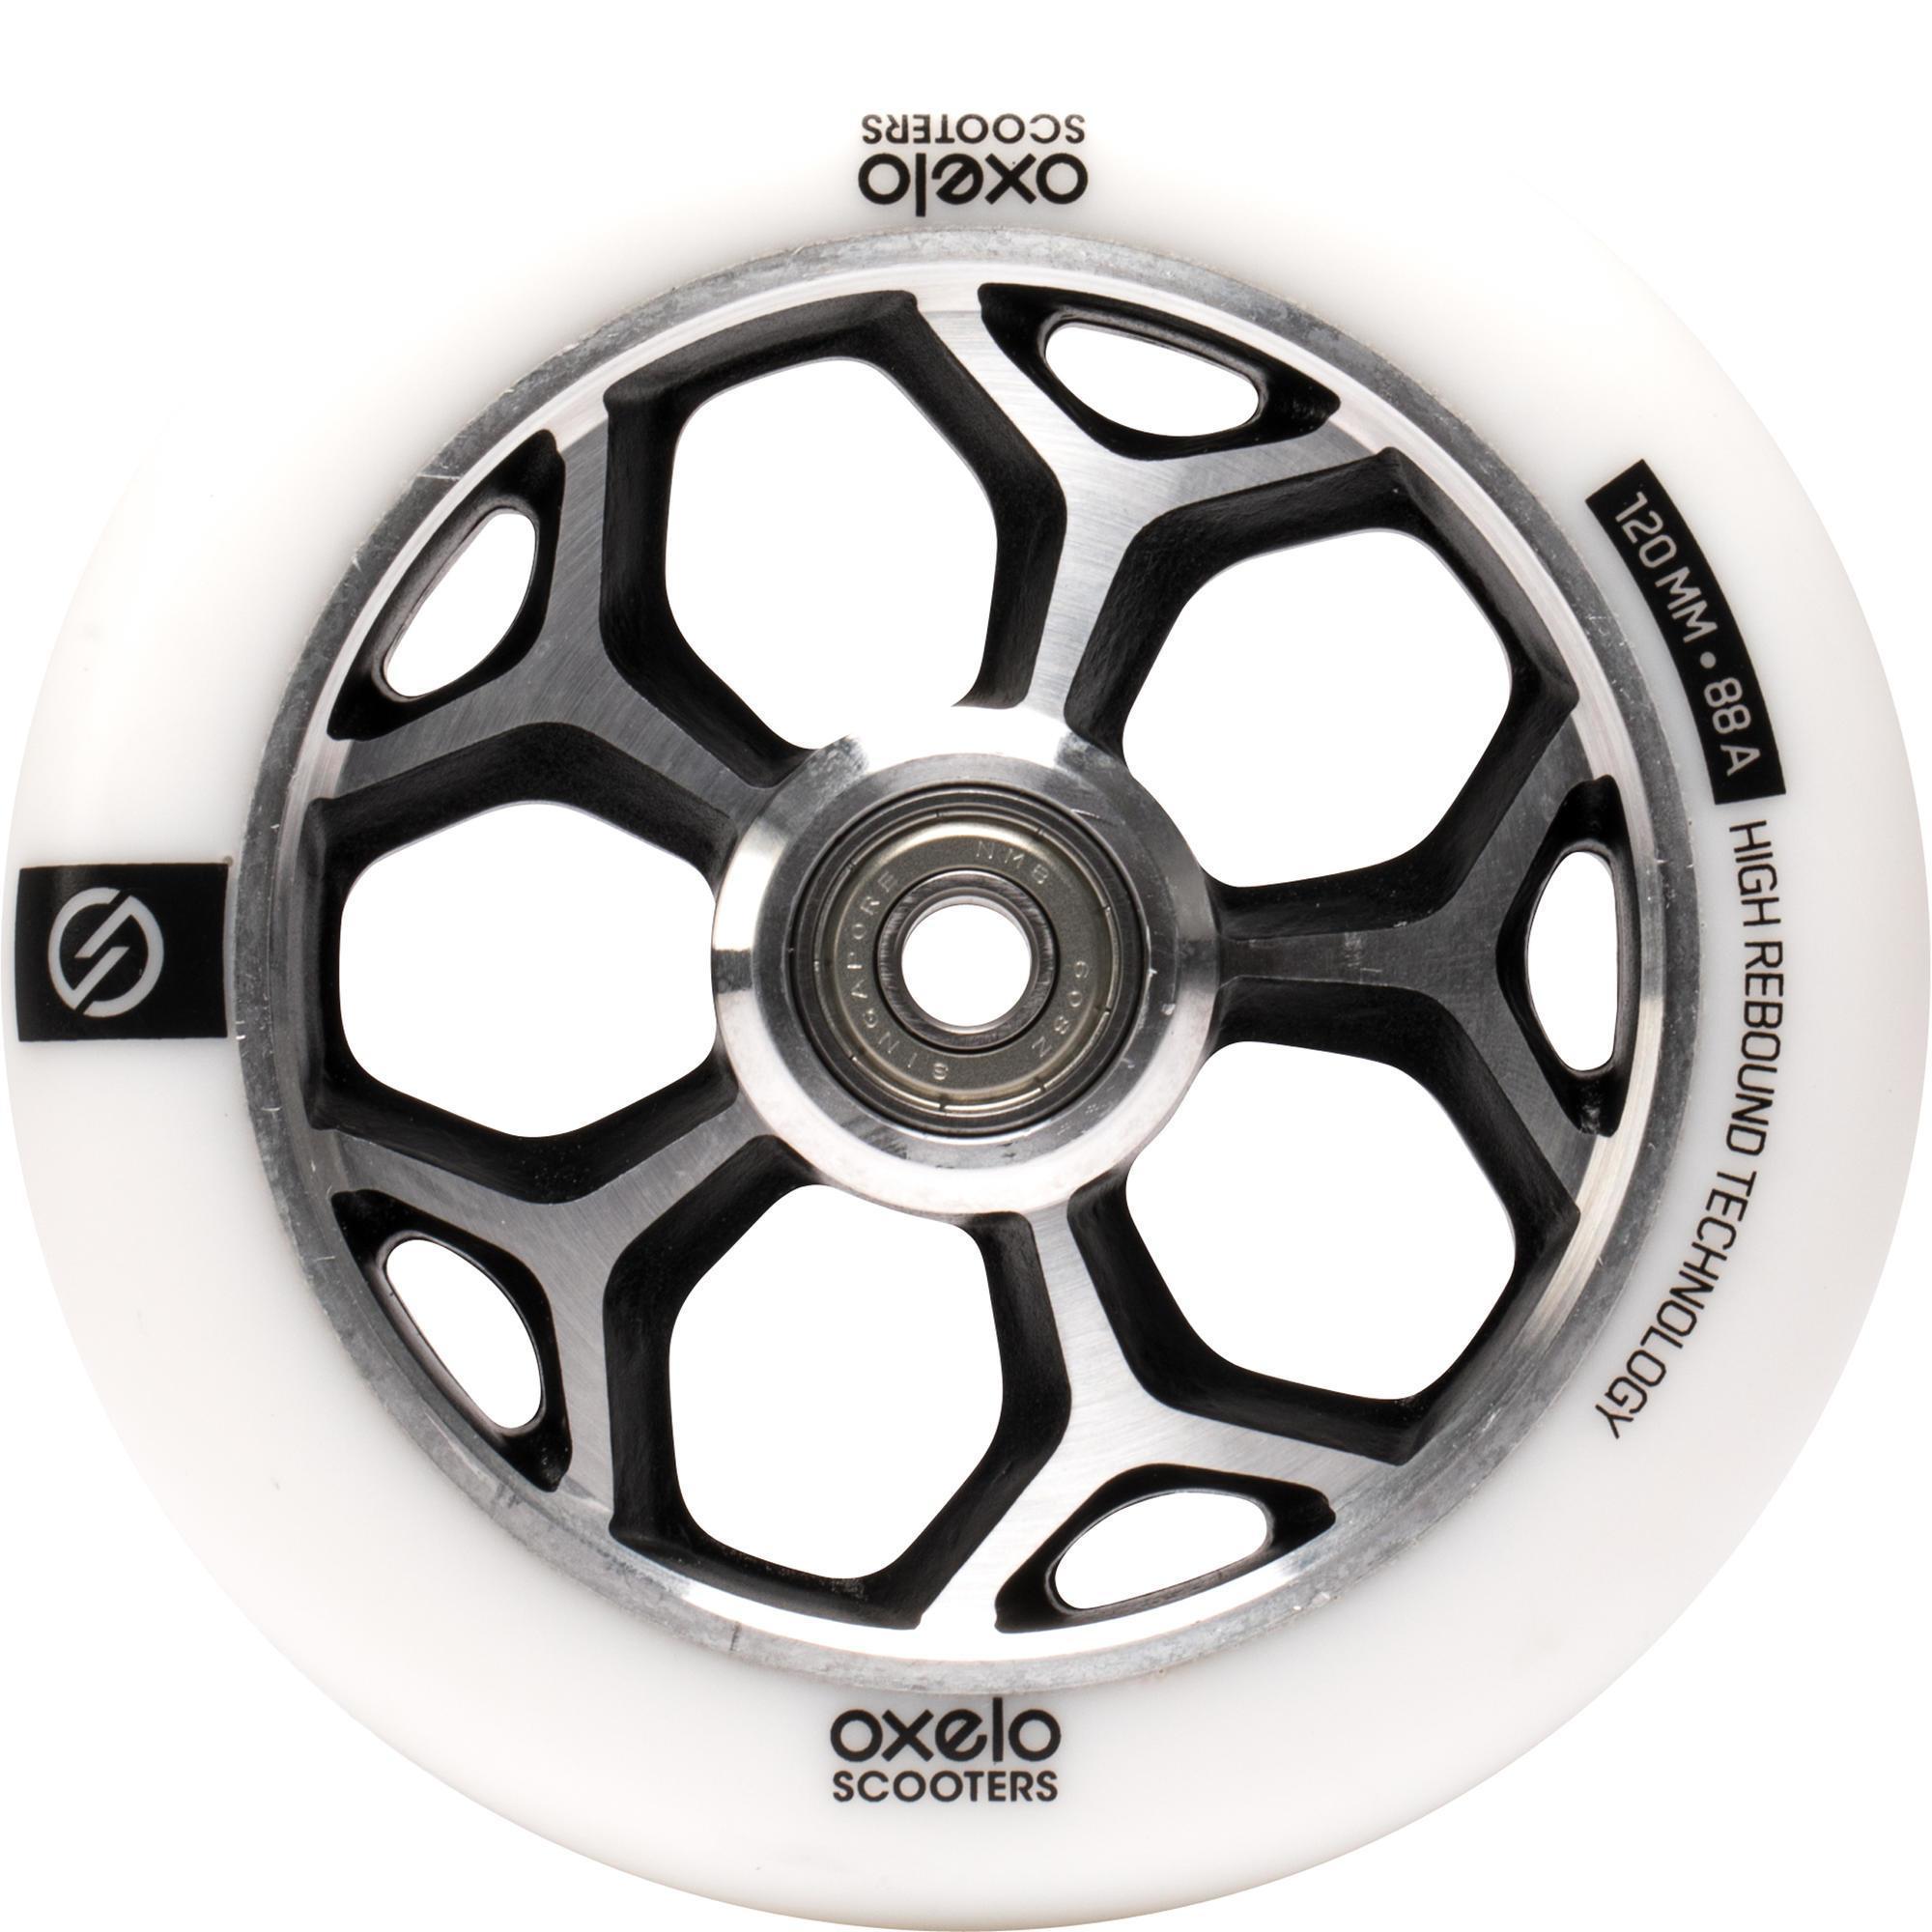 Oxelo Wiel voor freestylestep 120 mm wit / chroom